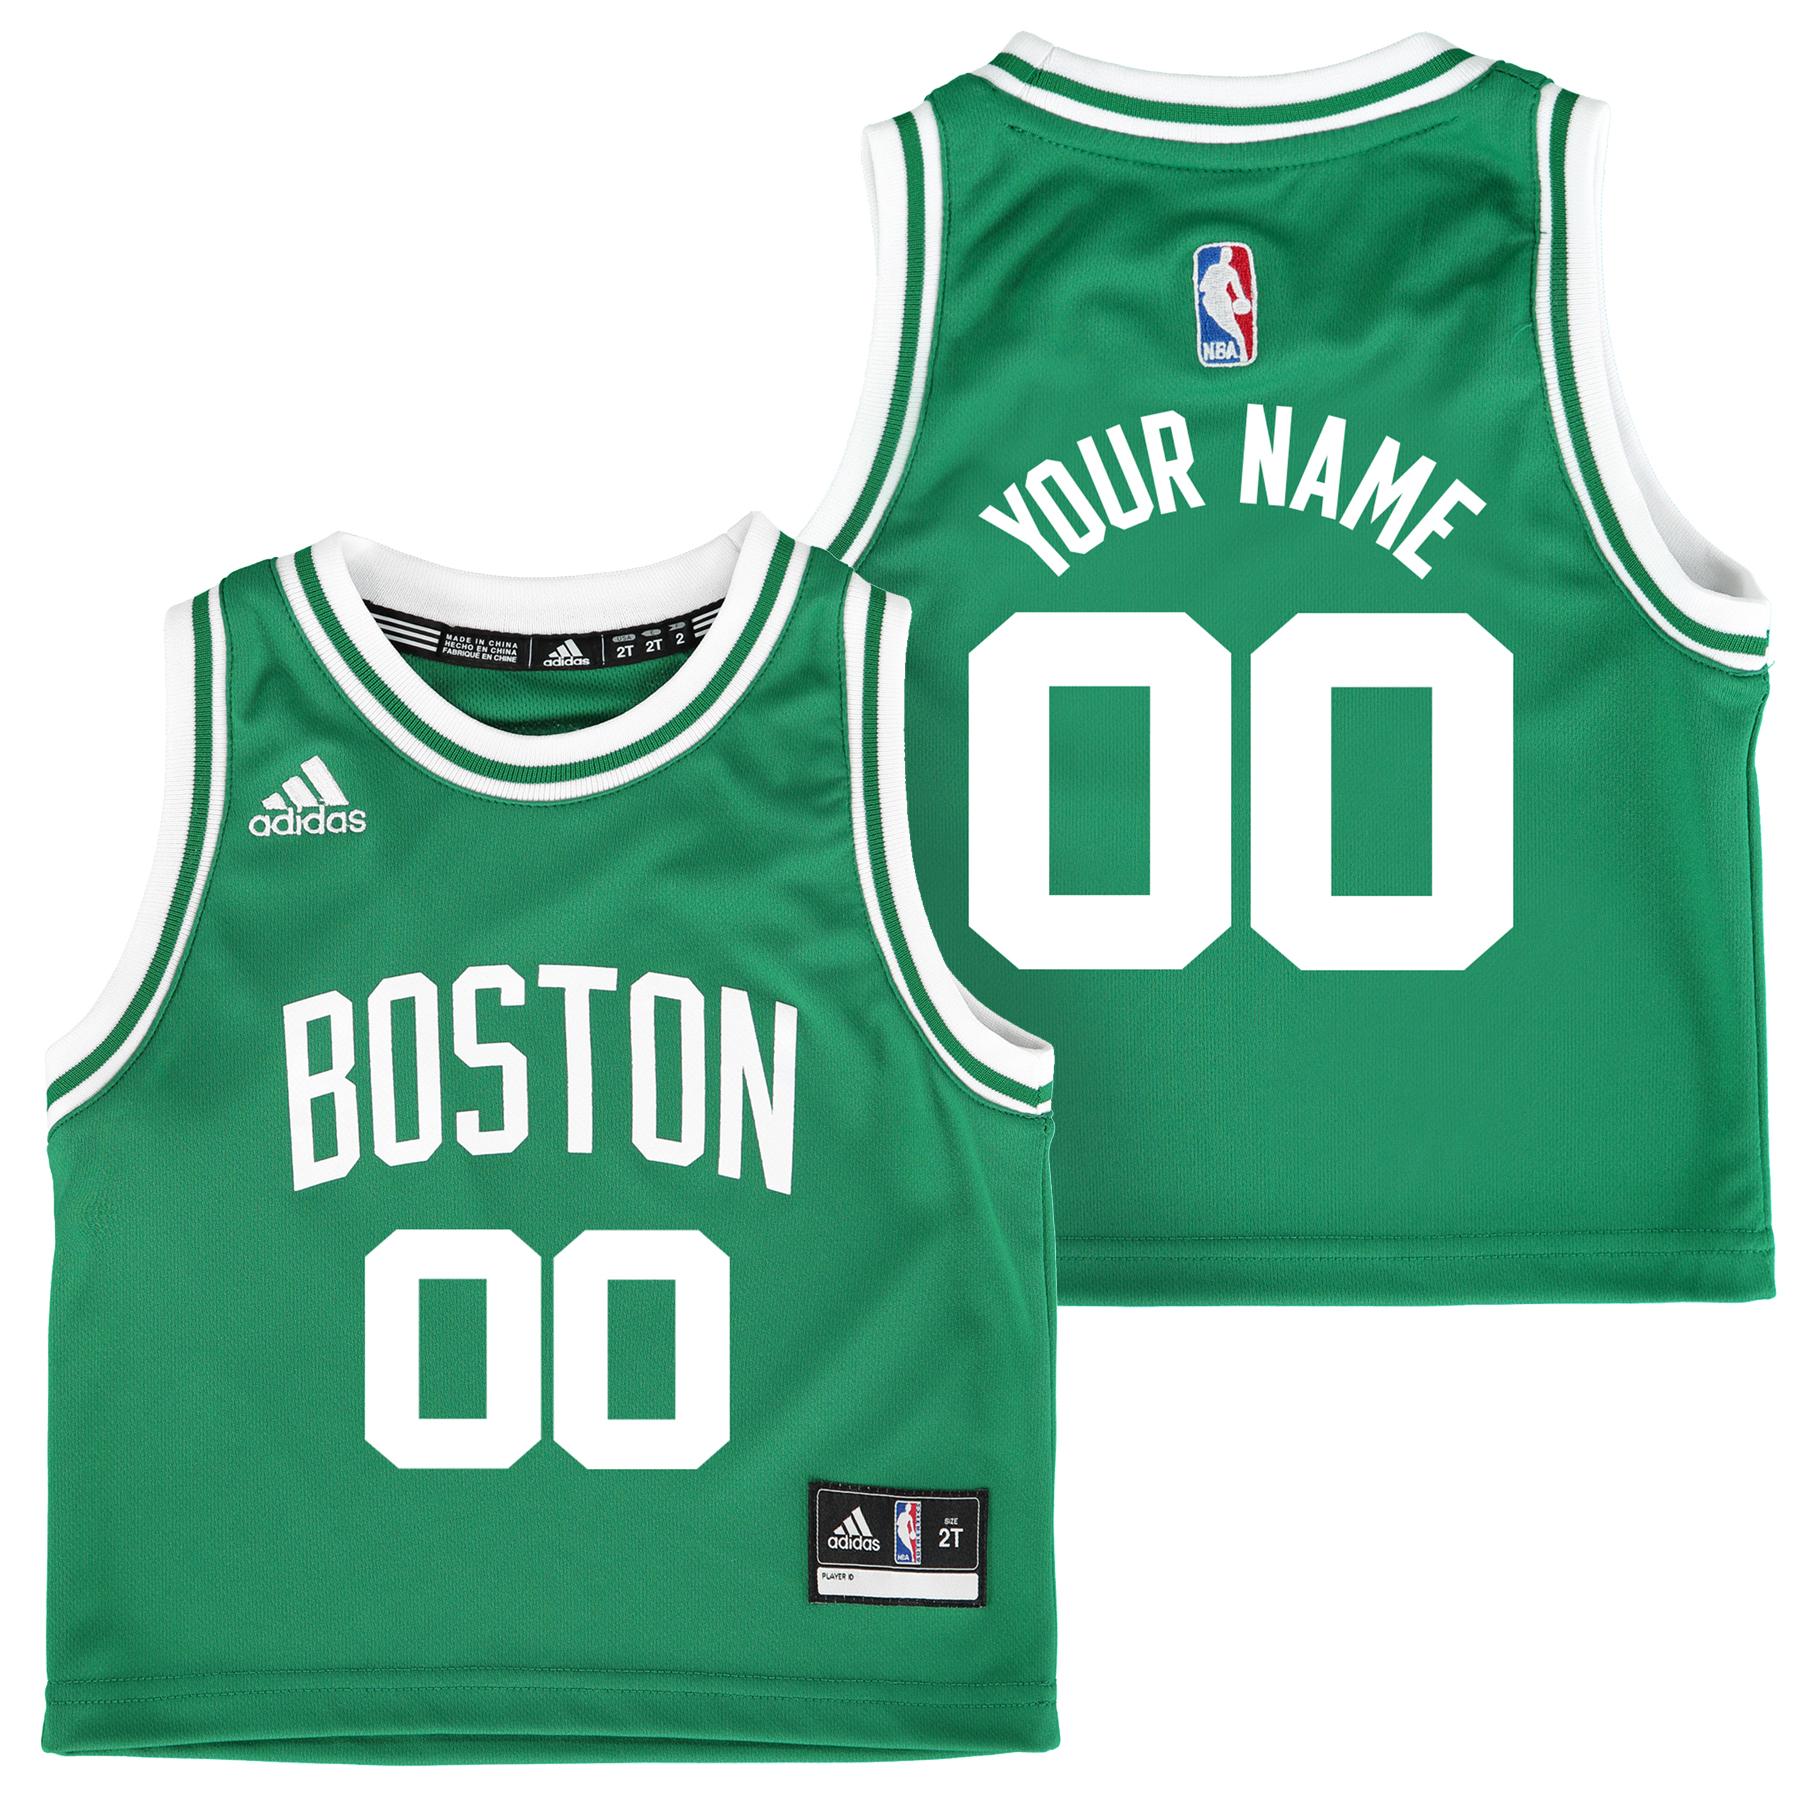 Boston Celtics Road Replica Jersey - Custom - Toddler